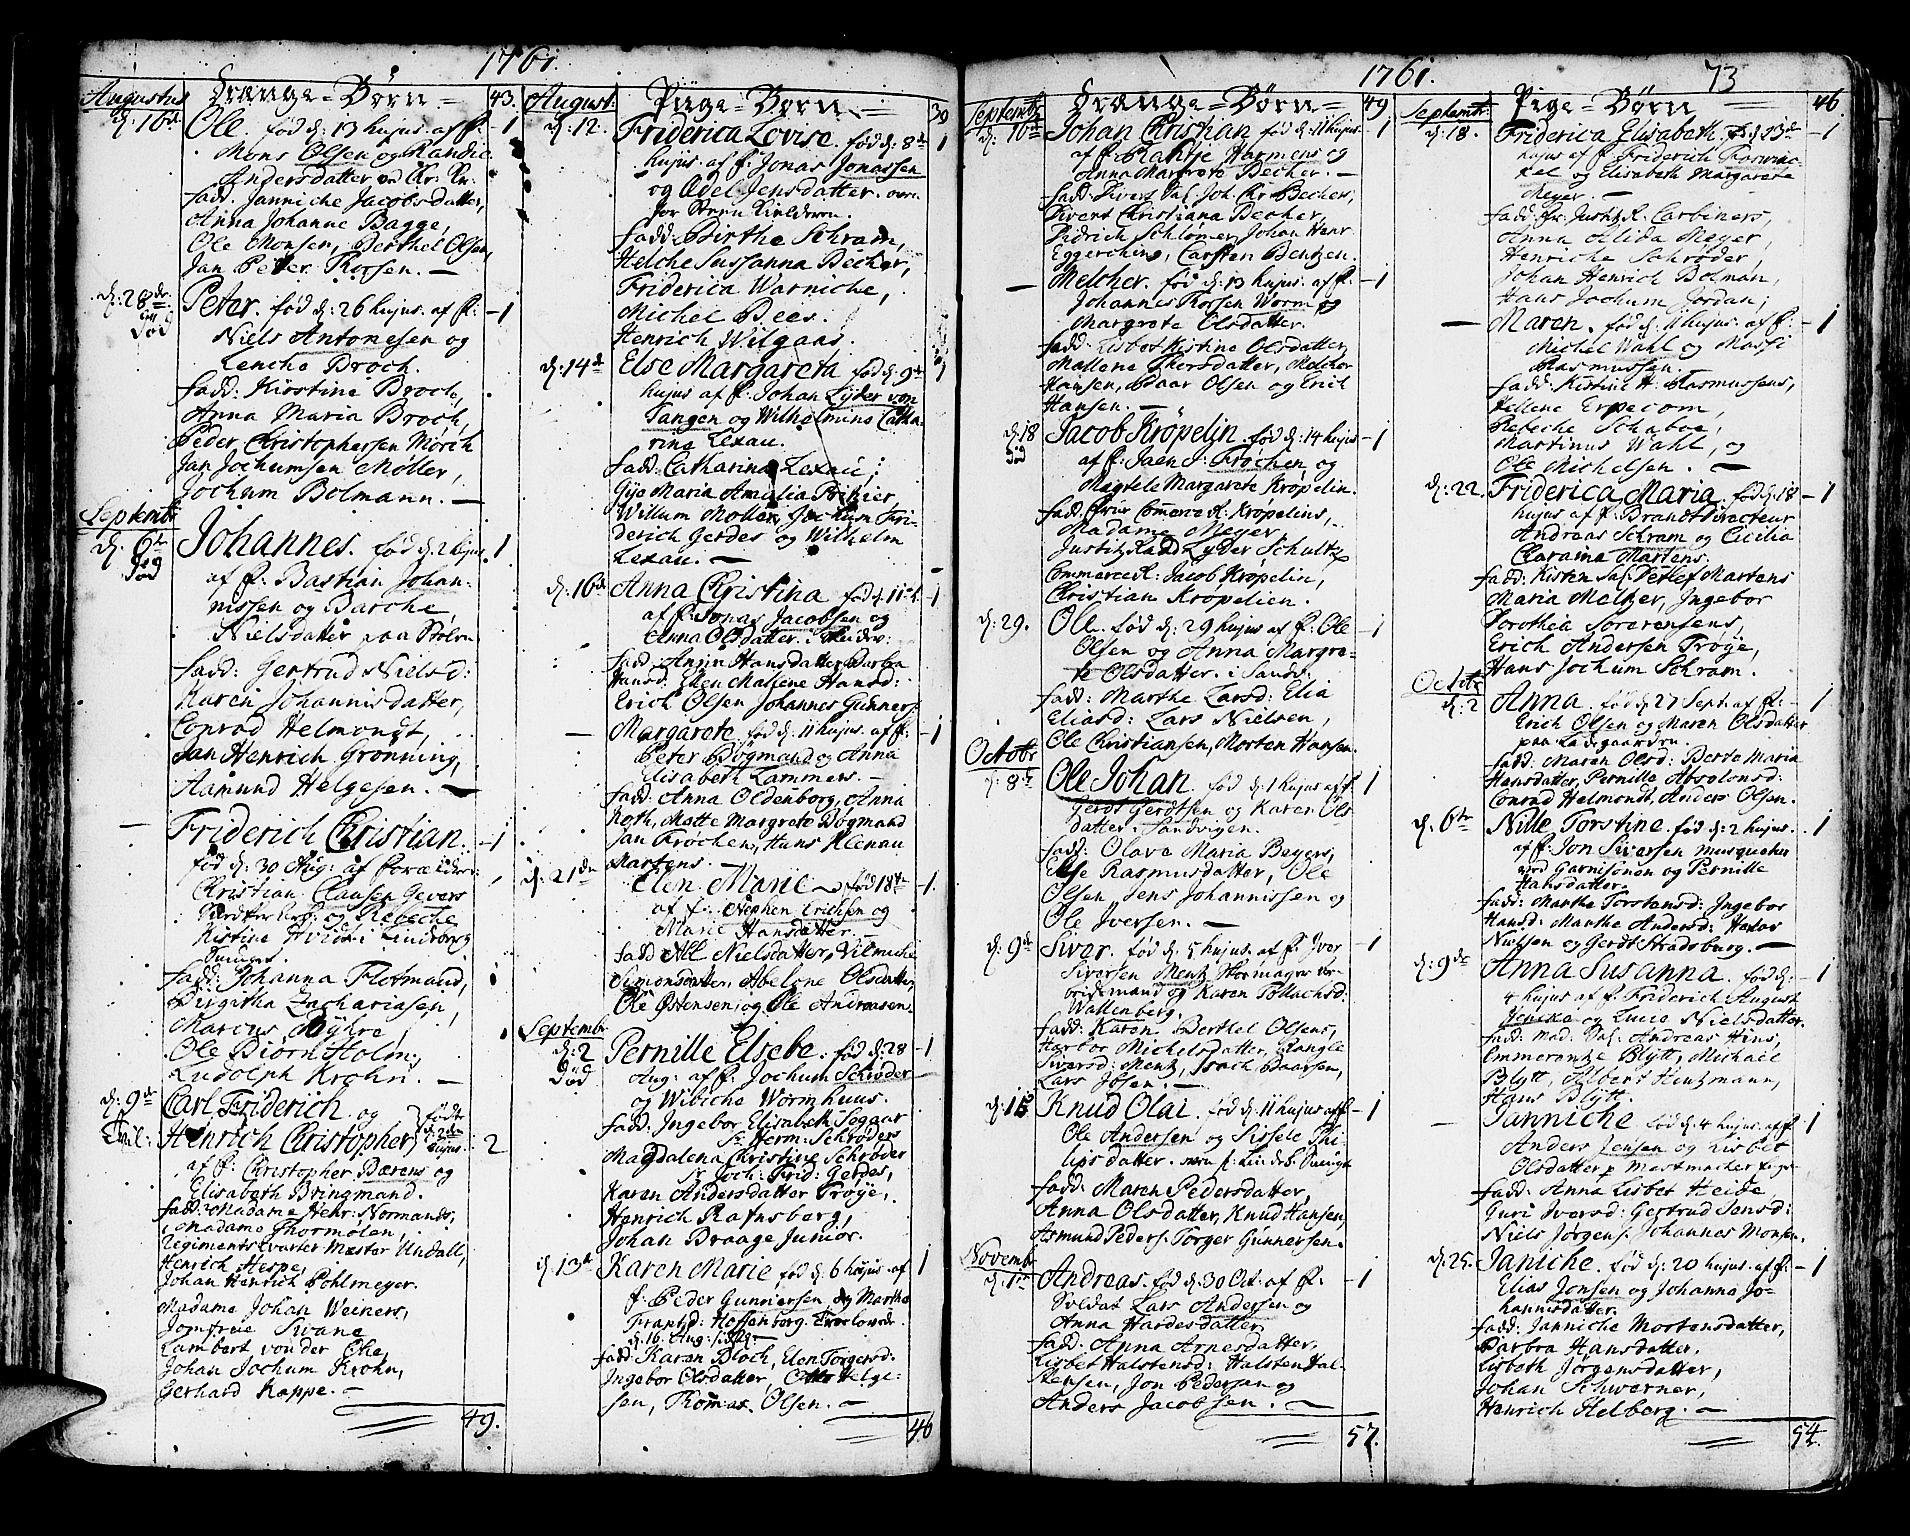 SAB, Korskirken Sokneprestembete, H/Haa/L0005: Ministerialbok nr. A 5, 1751-1789, s. 73